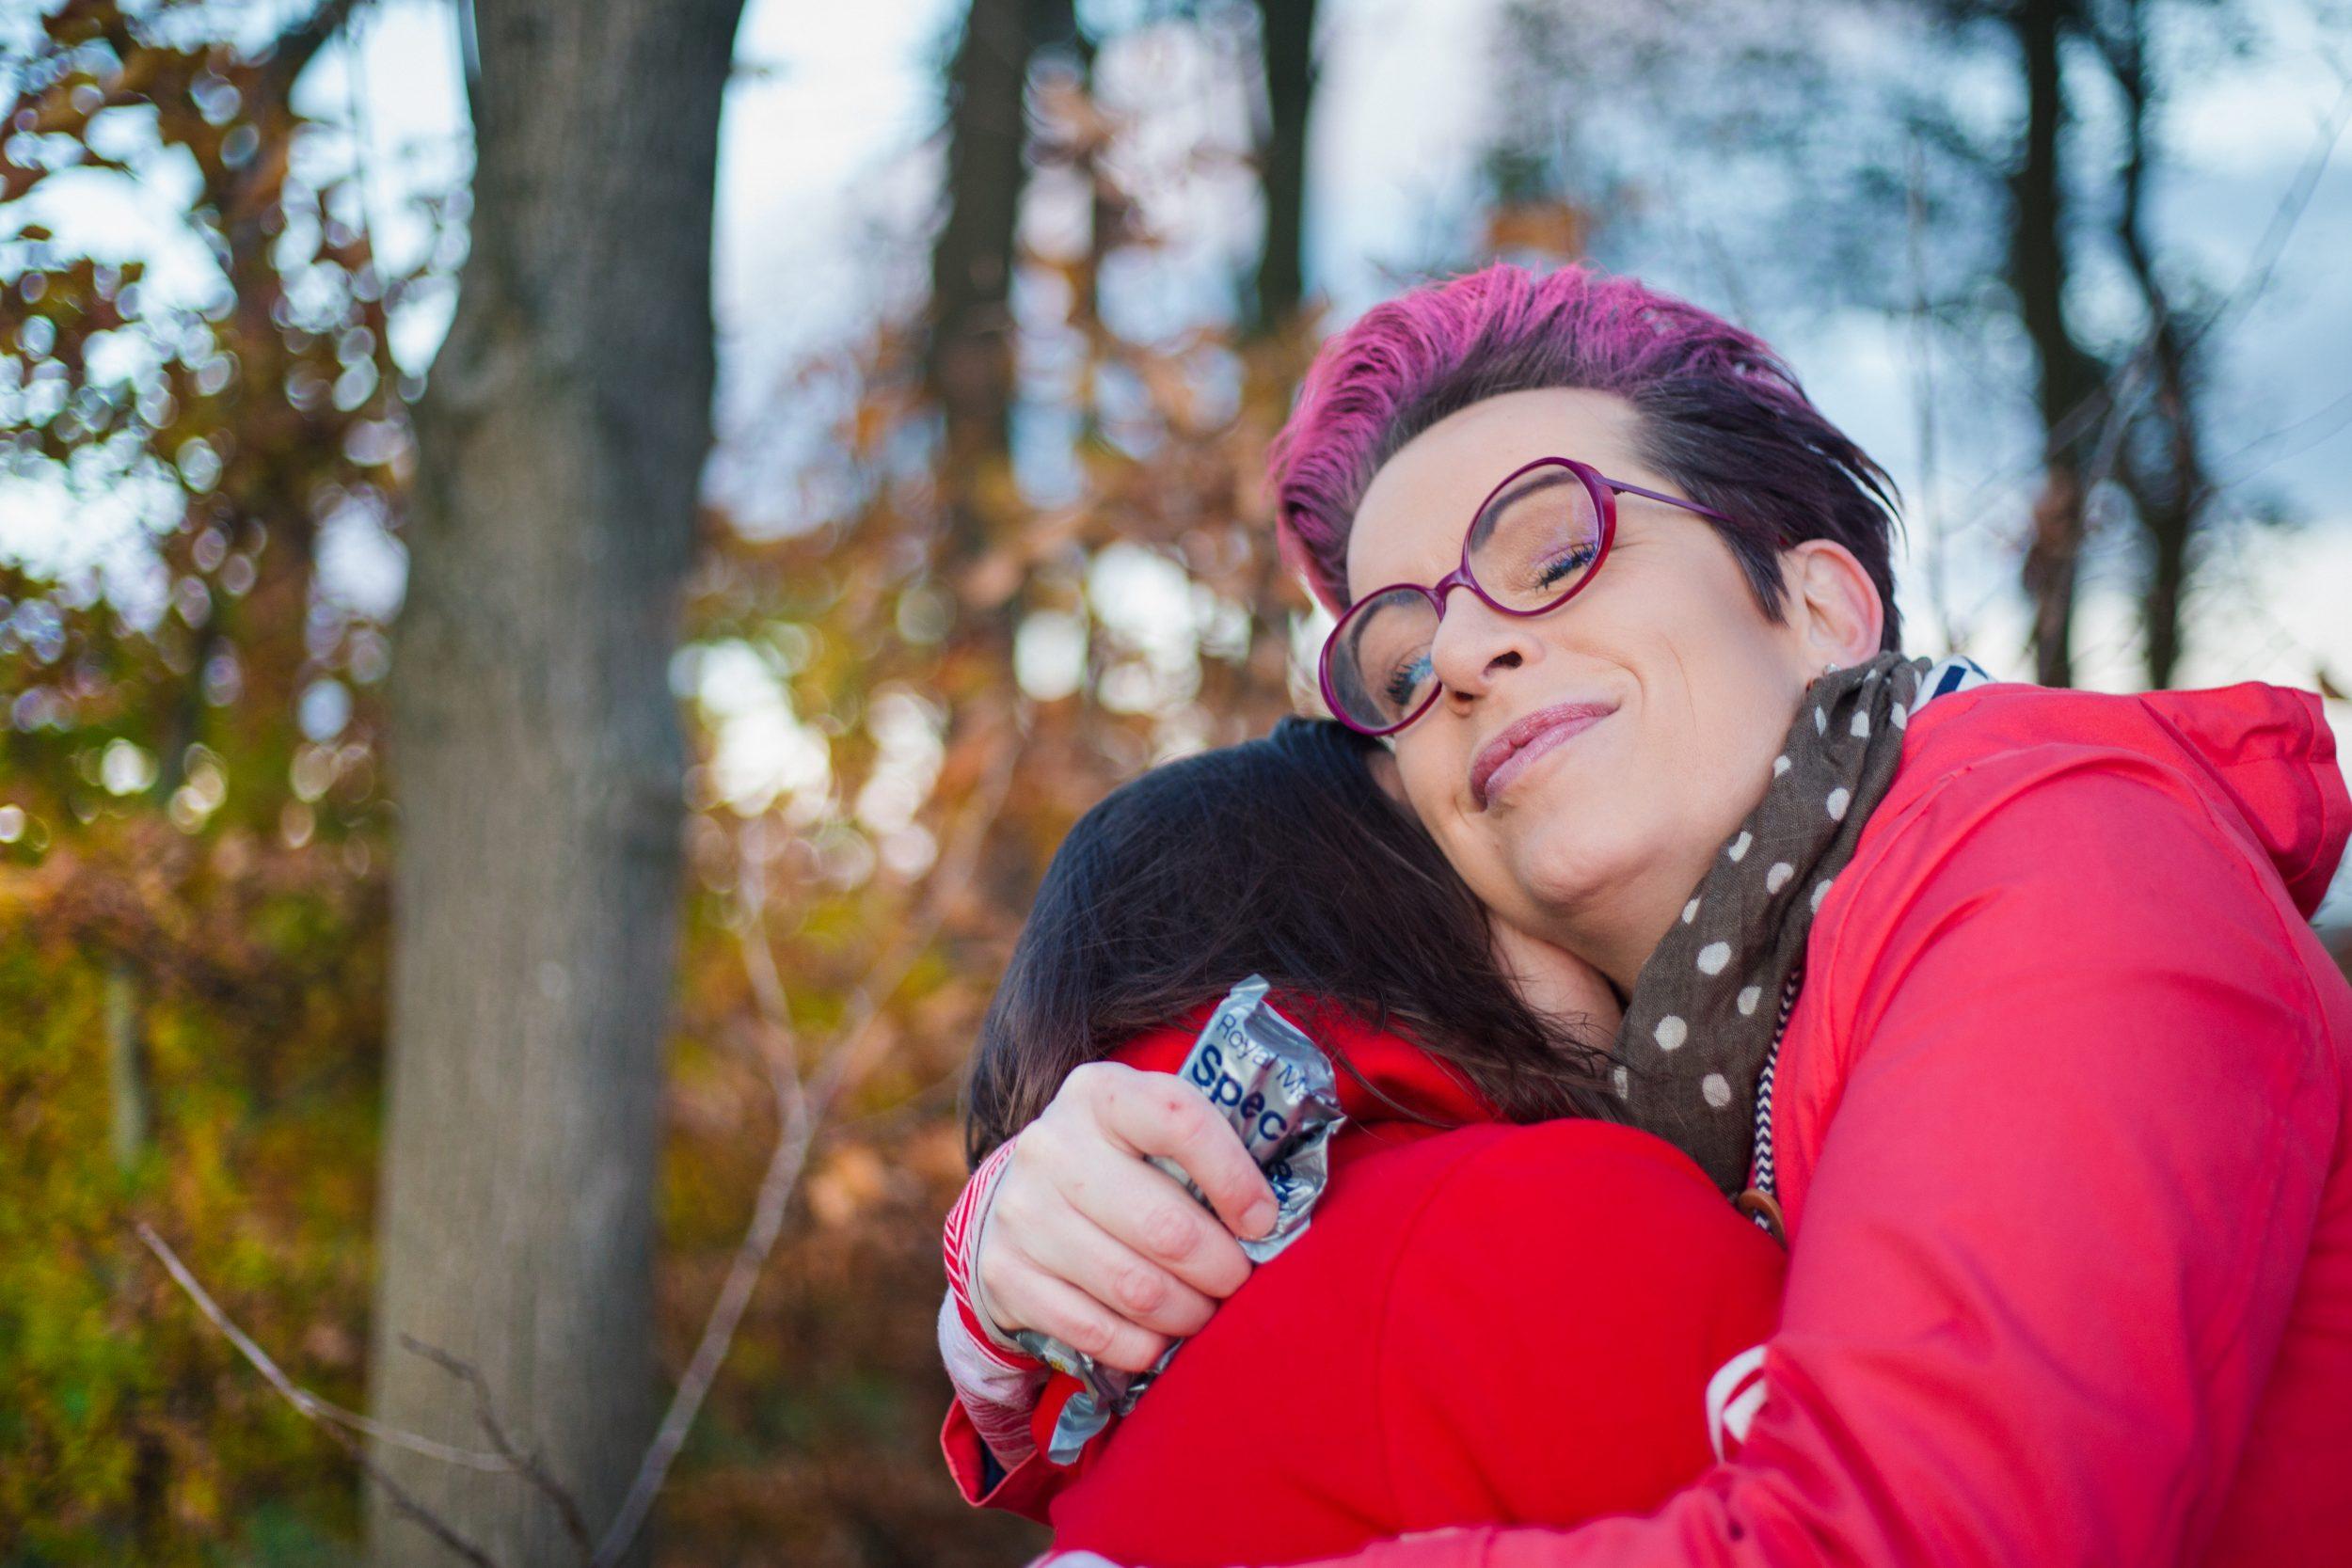 Carrie and Amanda share an intimate hug